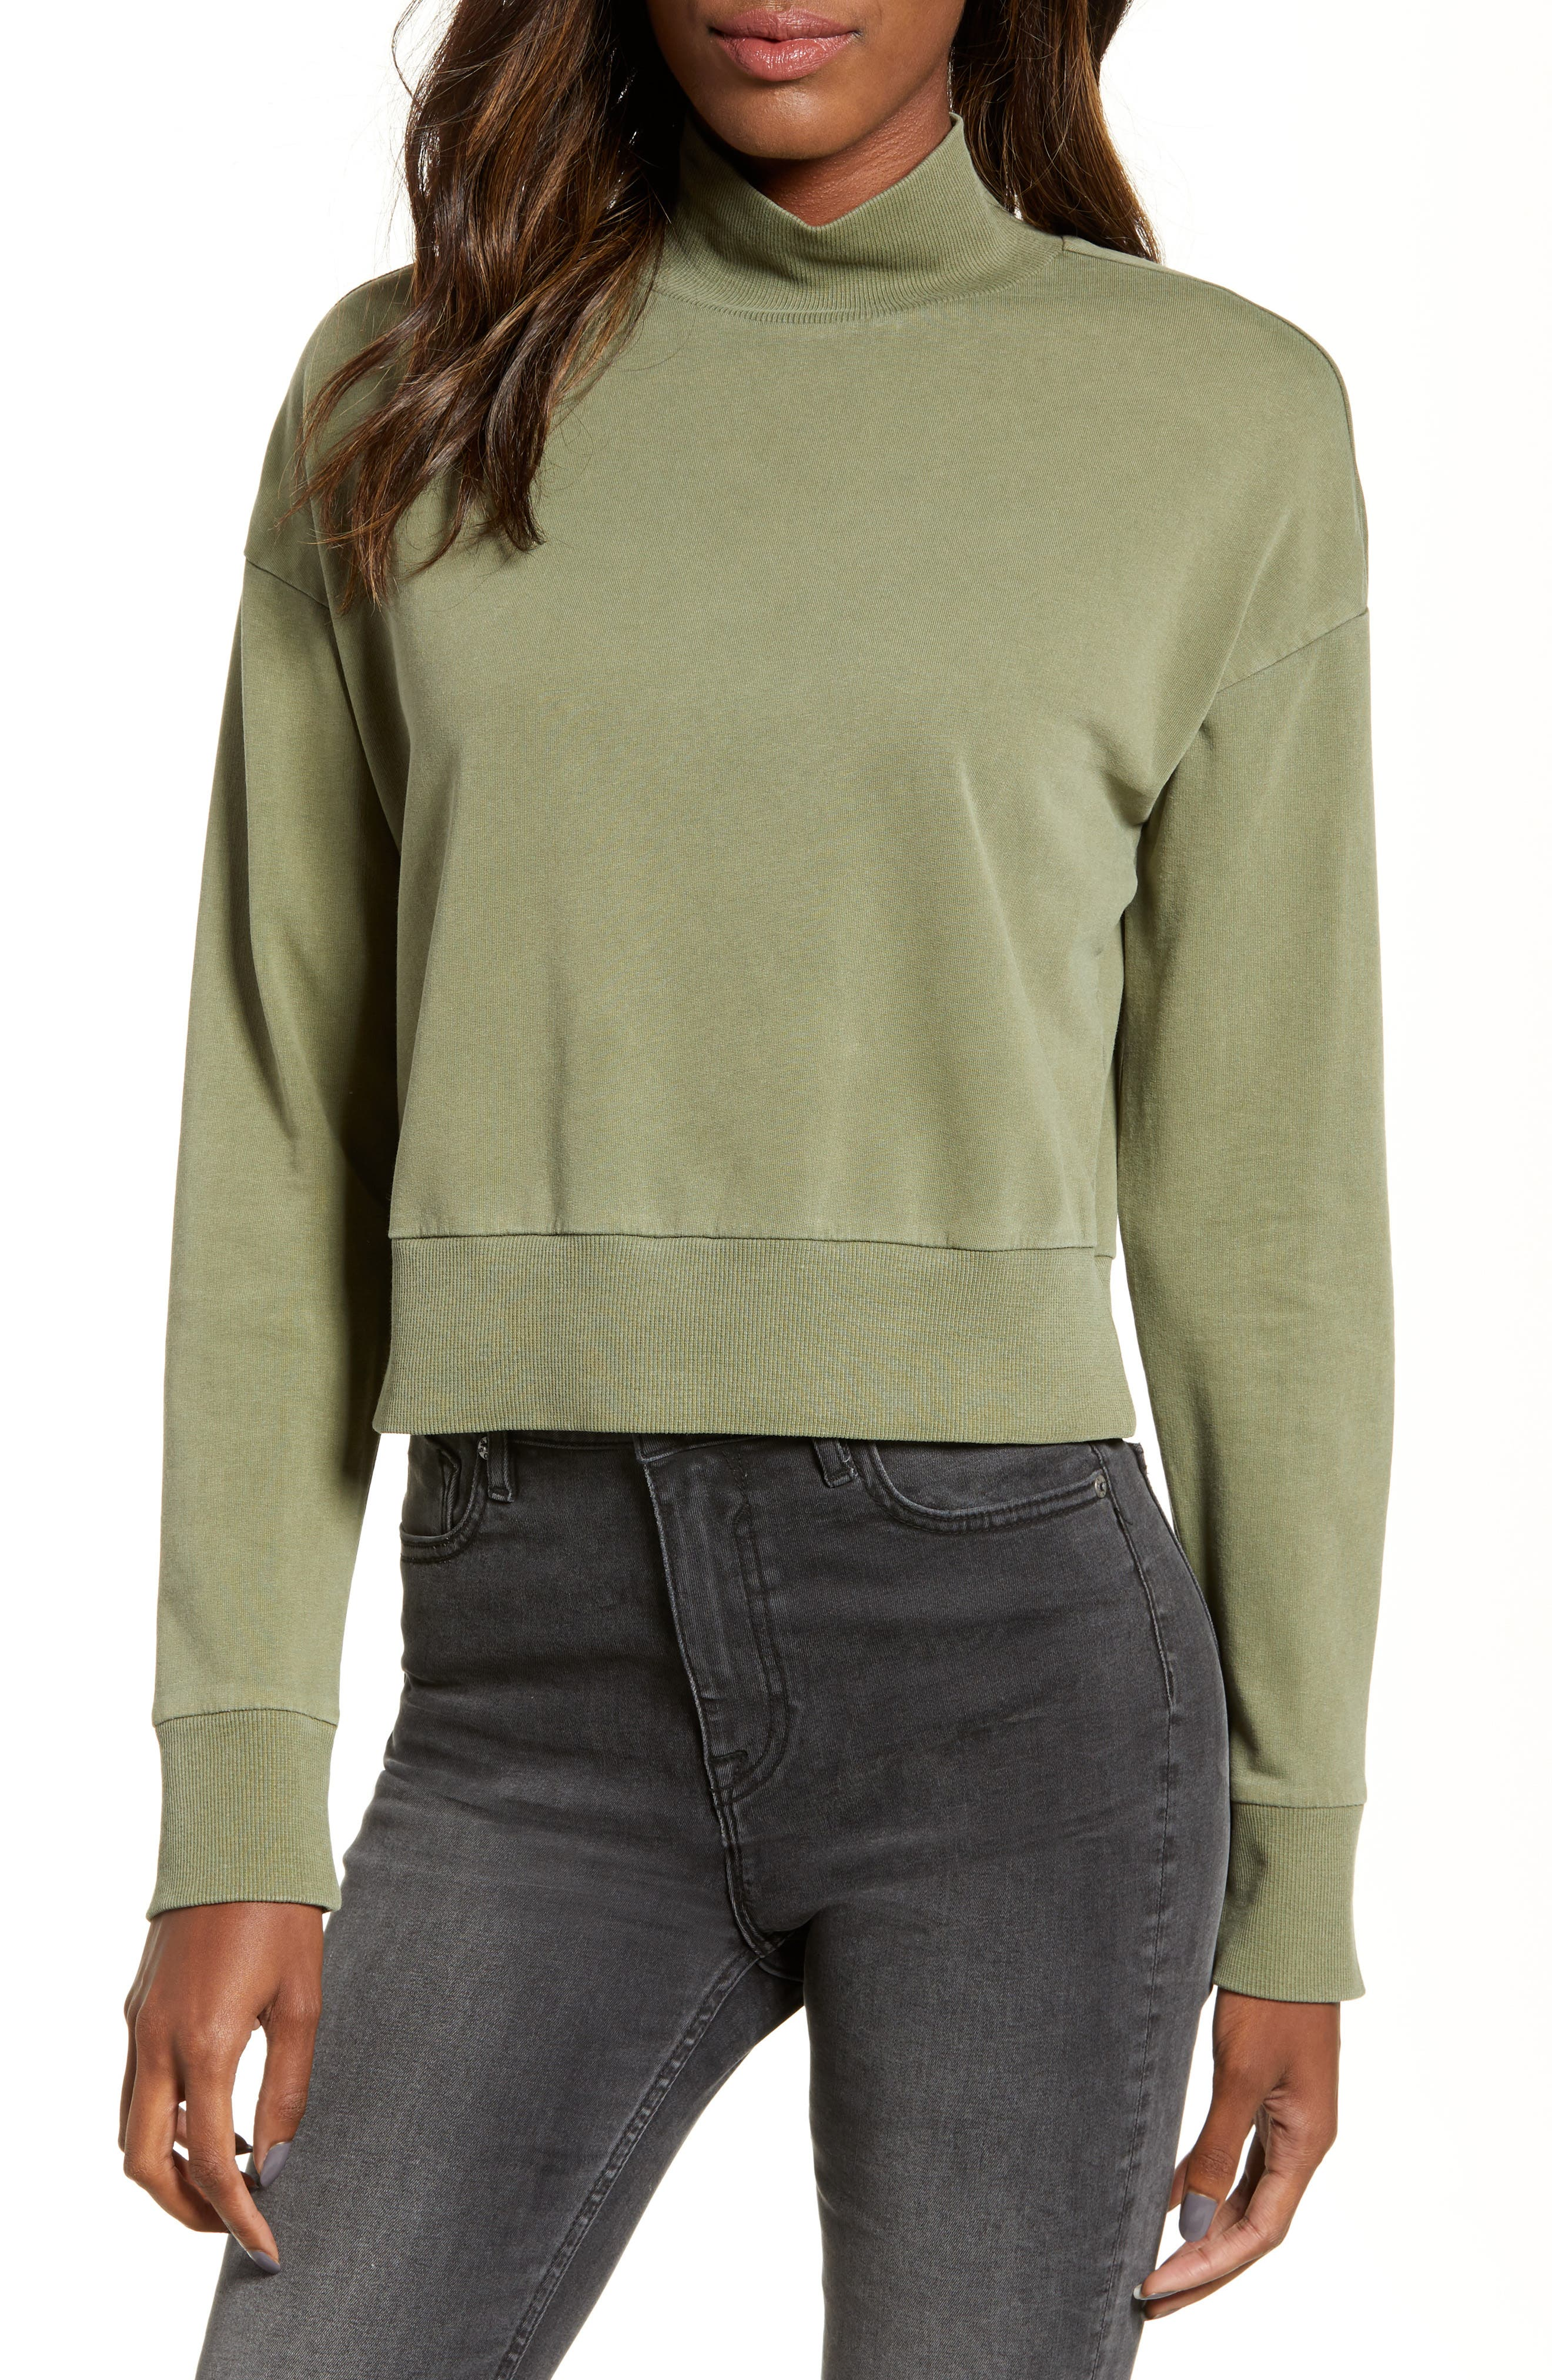 BP., Washed Mock Neck Sweatshirt, Main thumbnail 1, color, OLIVE BURNT